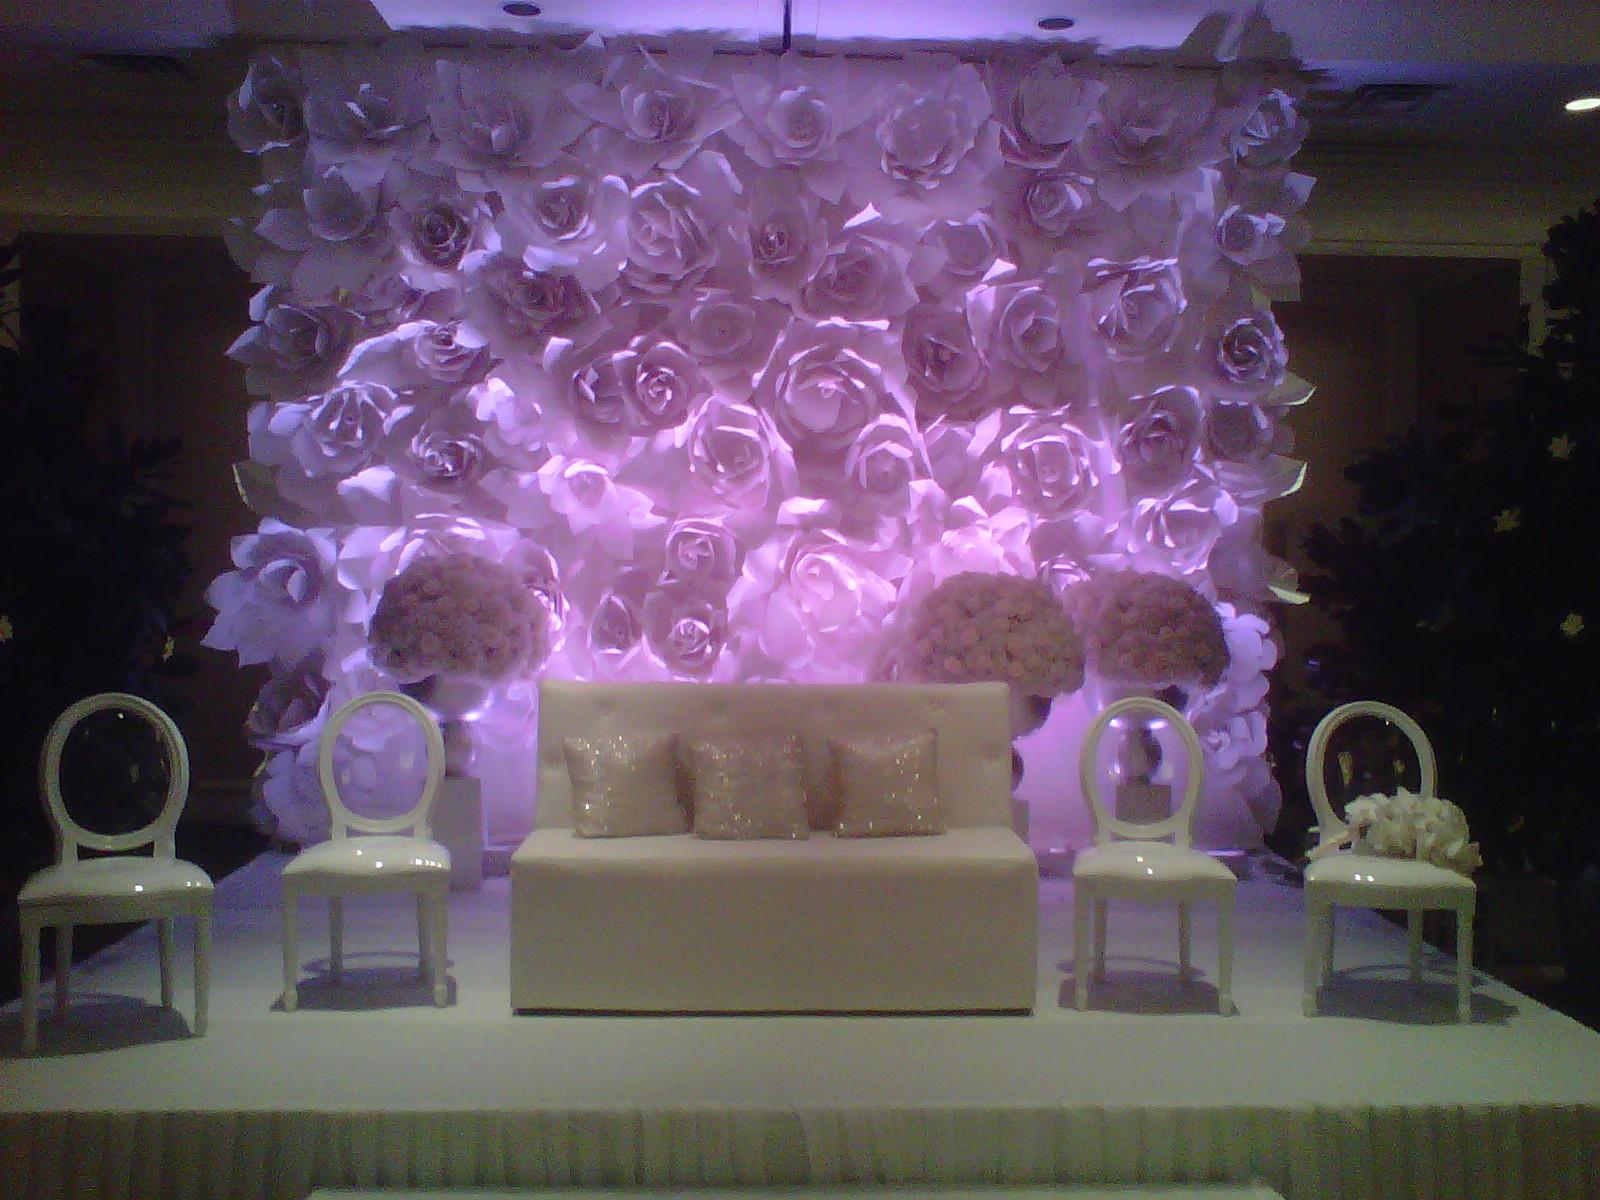 http://2.bp.blogspot.com/-I7rMWyihdEA/UIap6VgzOII/AAAAAAAAApY/xpQc4Wm1f-Y/s1600/chanel-wedding-paper-flower-stjudescreations1.jpg